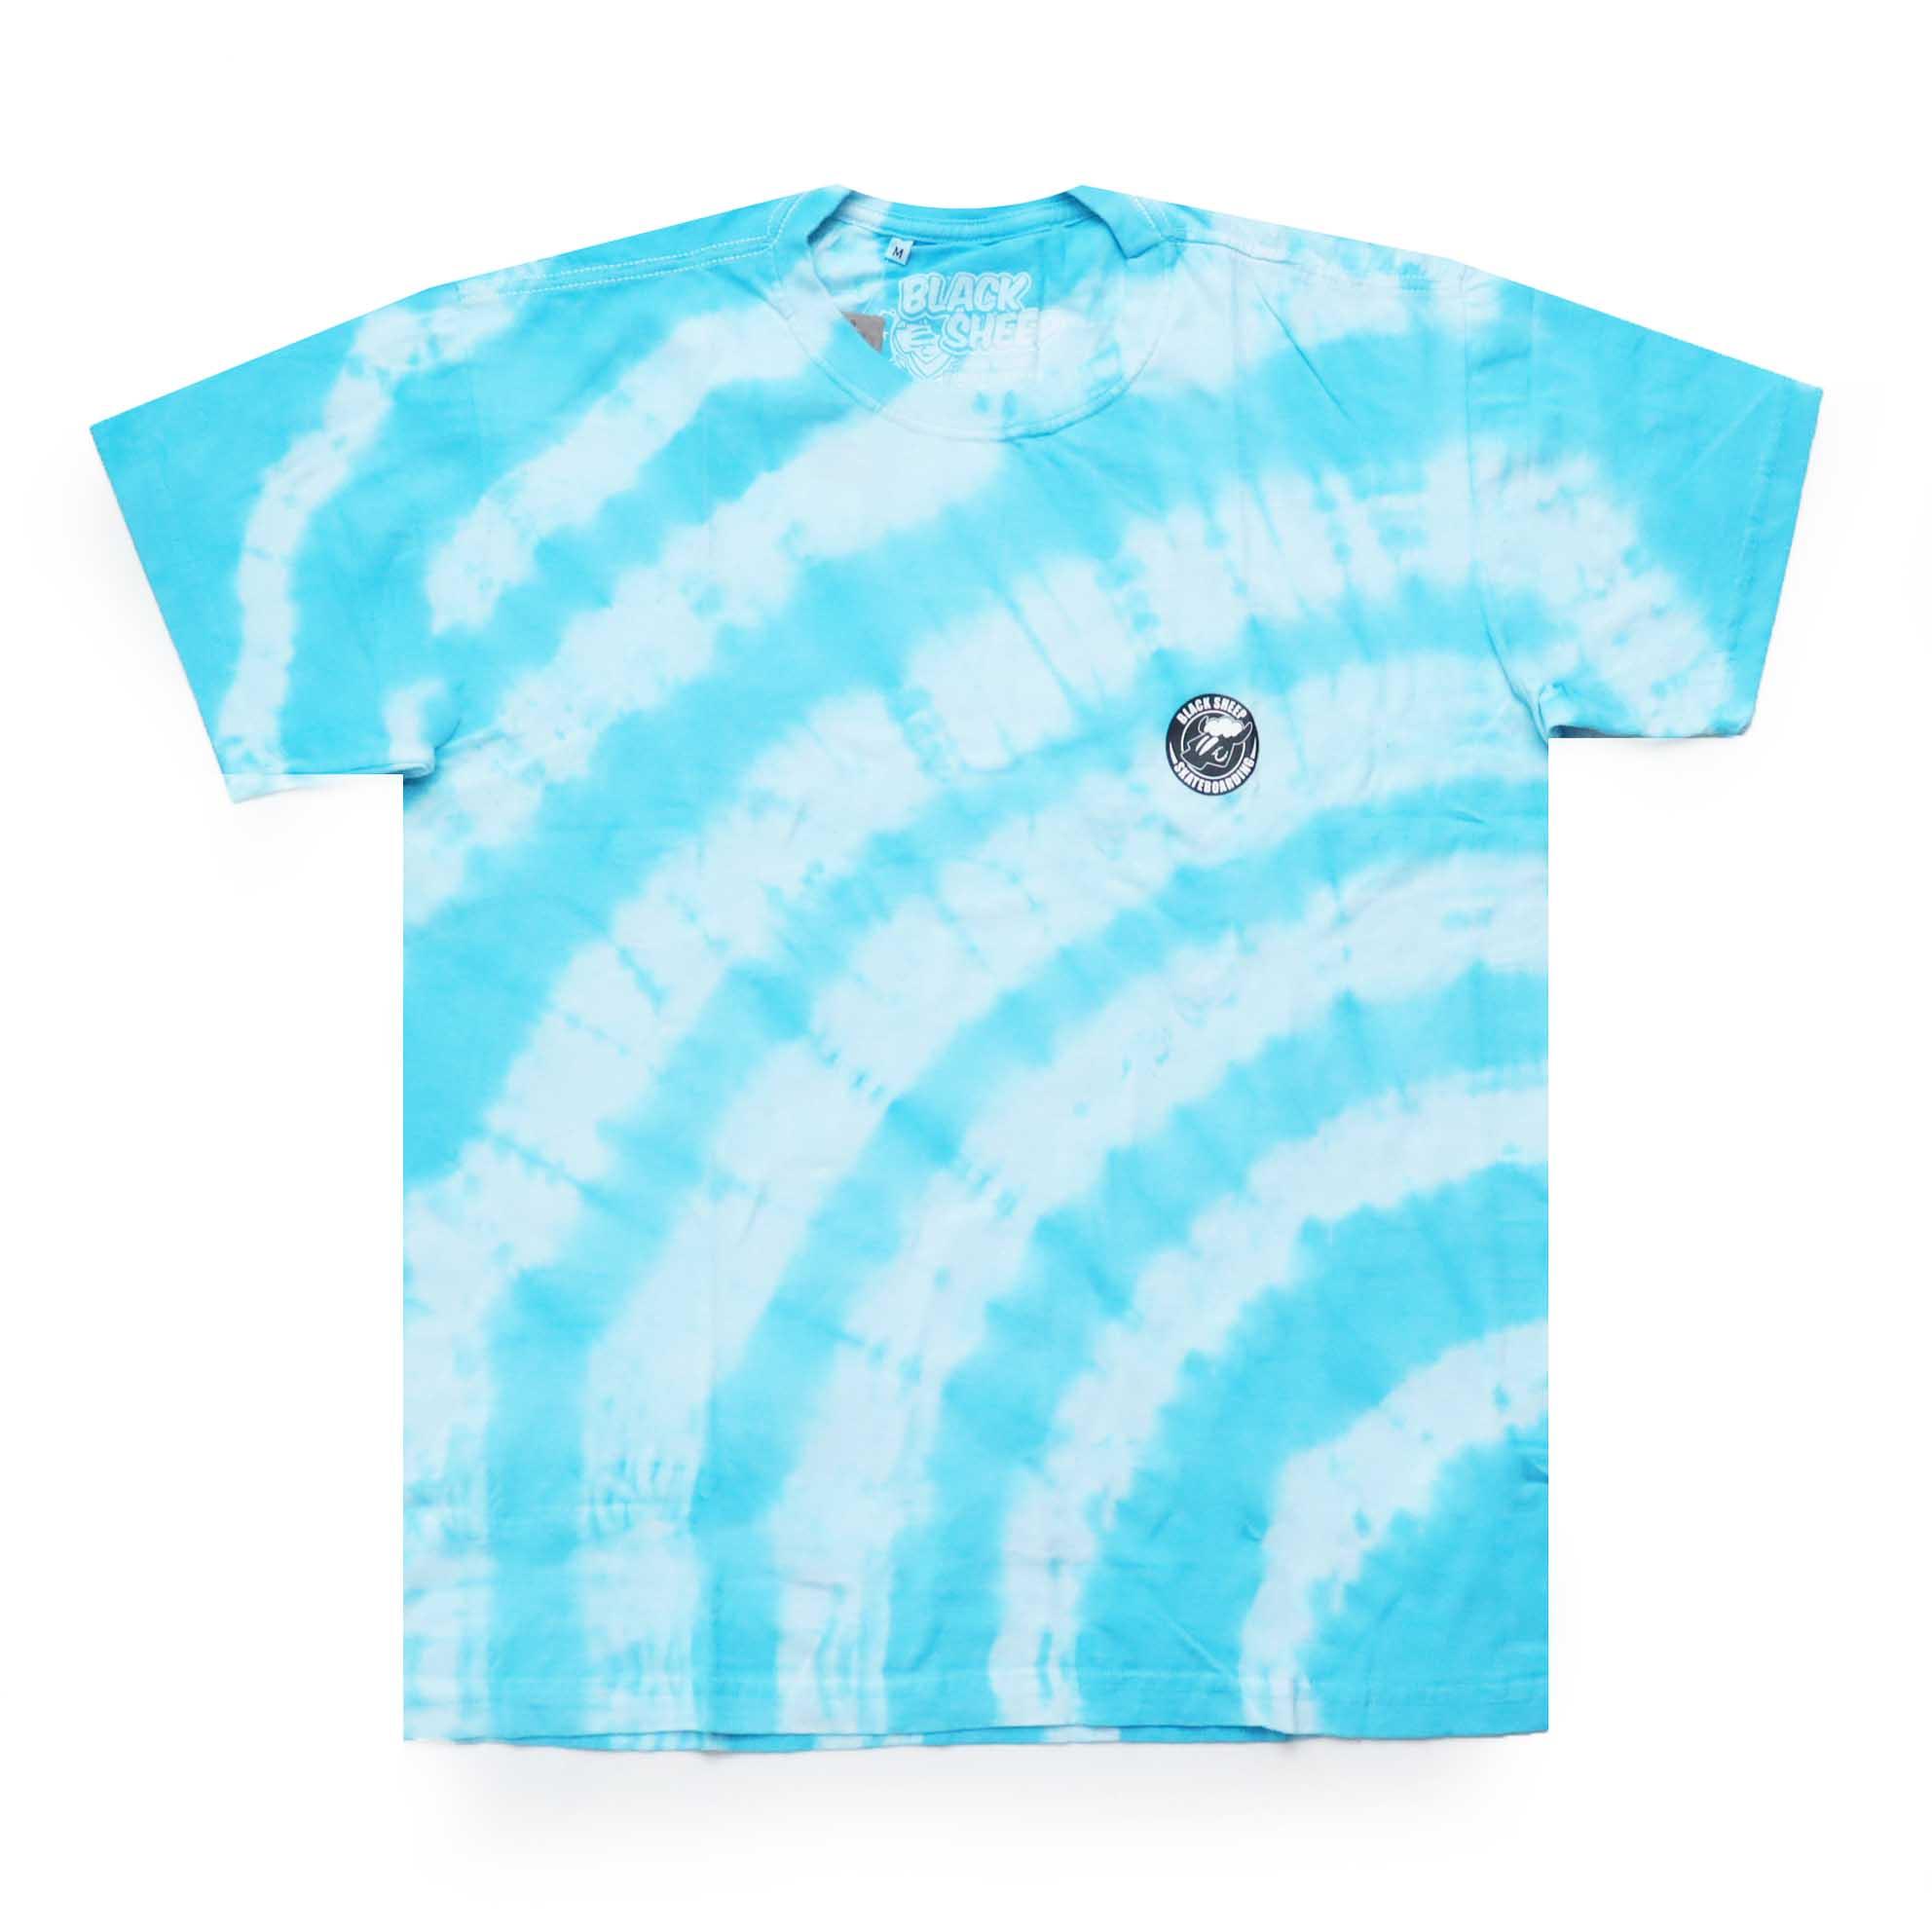 Camiseta Black Sheep - Tie Dye Azul